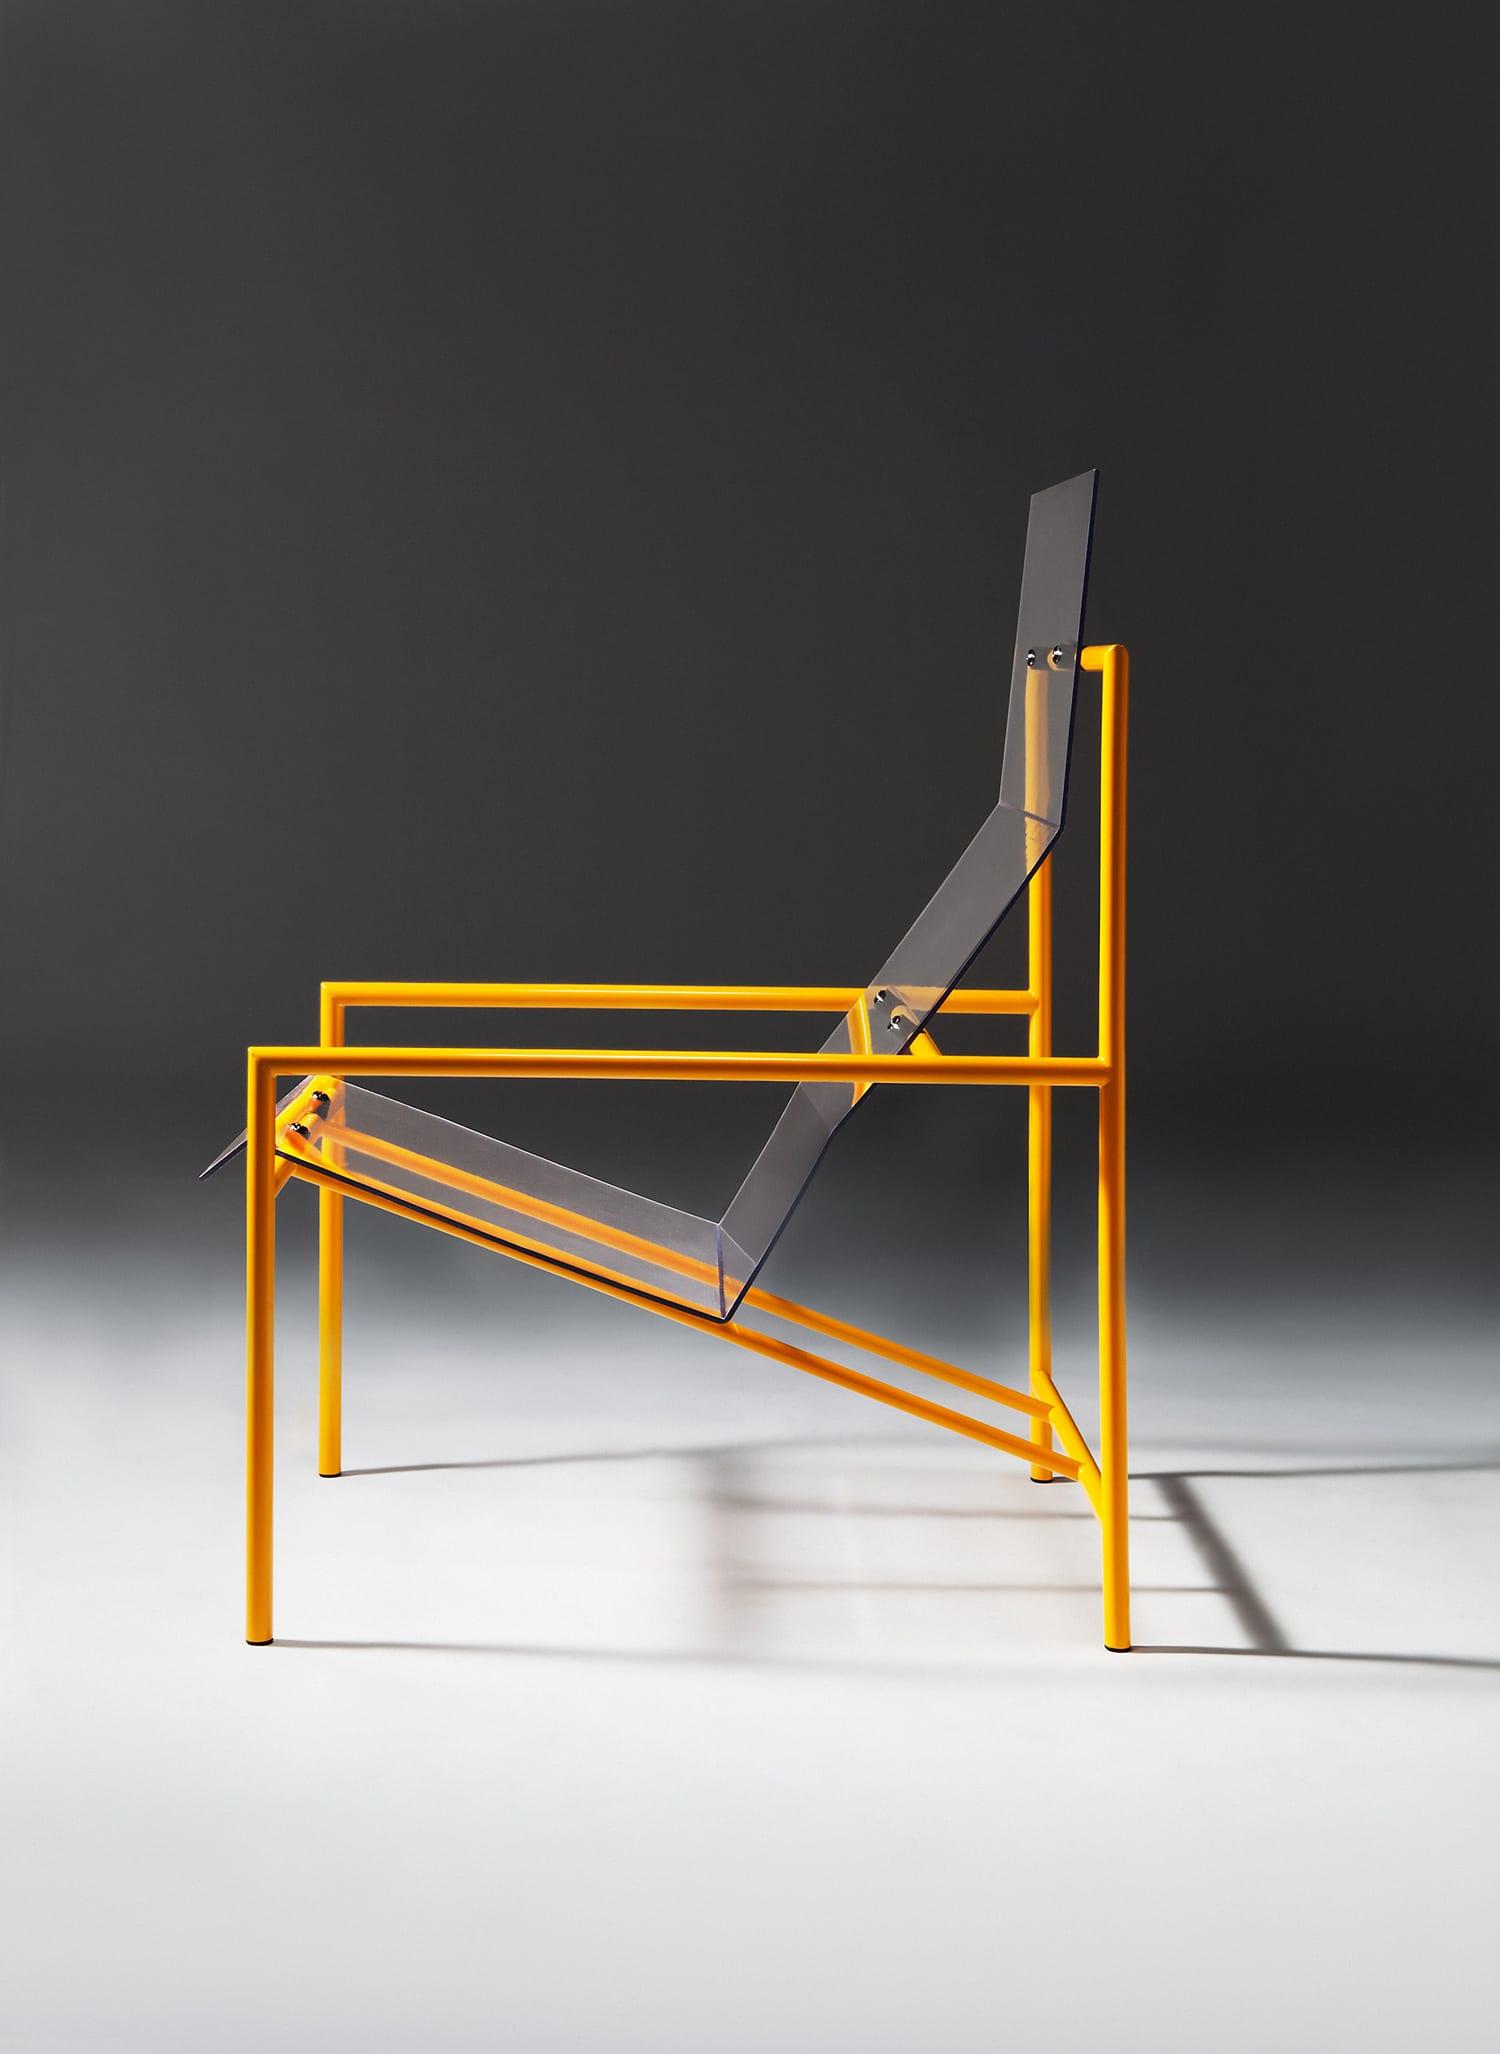 Nirvana Aalto University Students at Stockholm Furniture Fair 2018   Yellowtrace